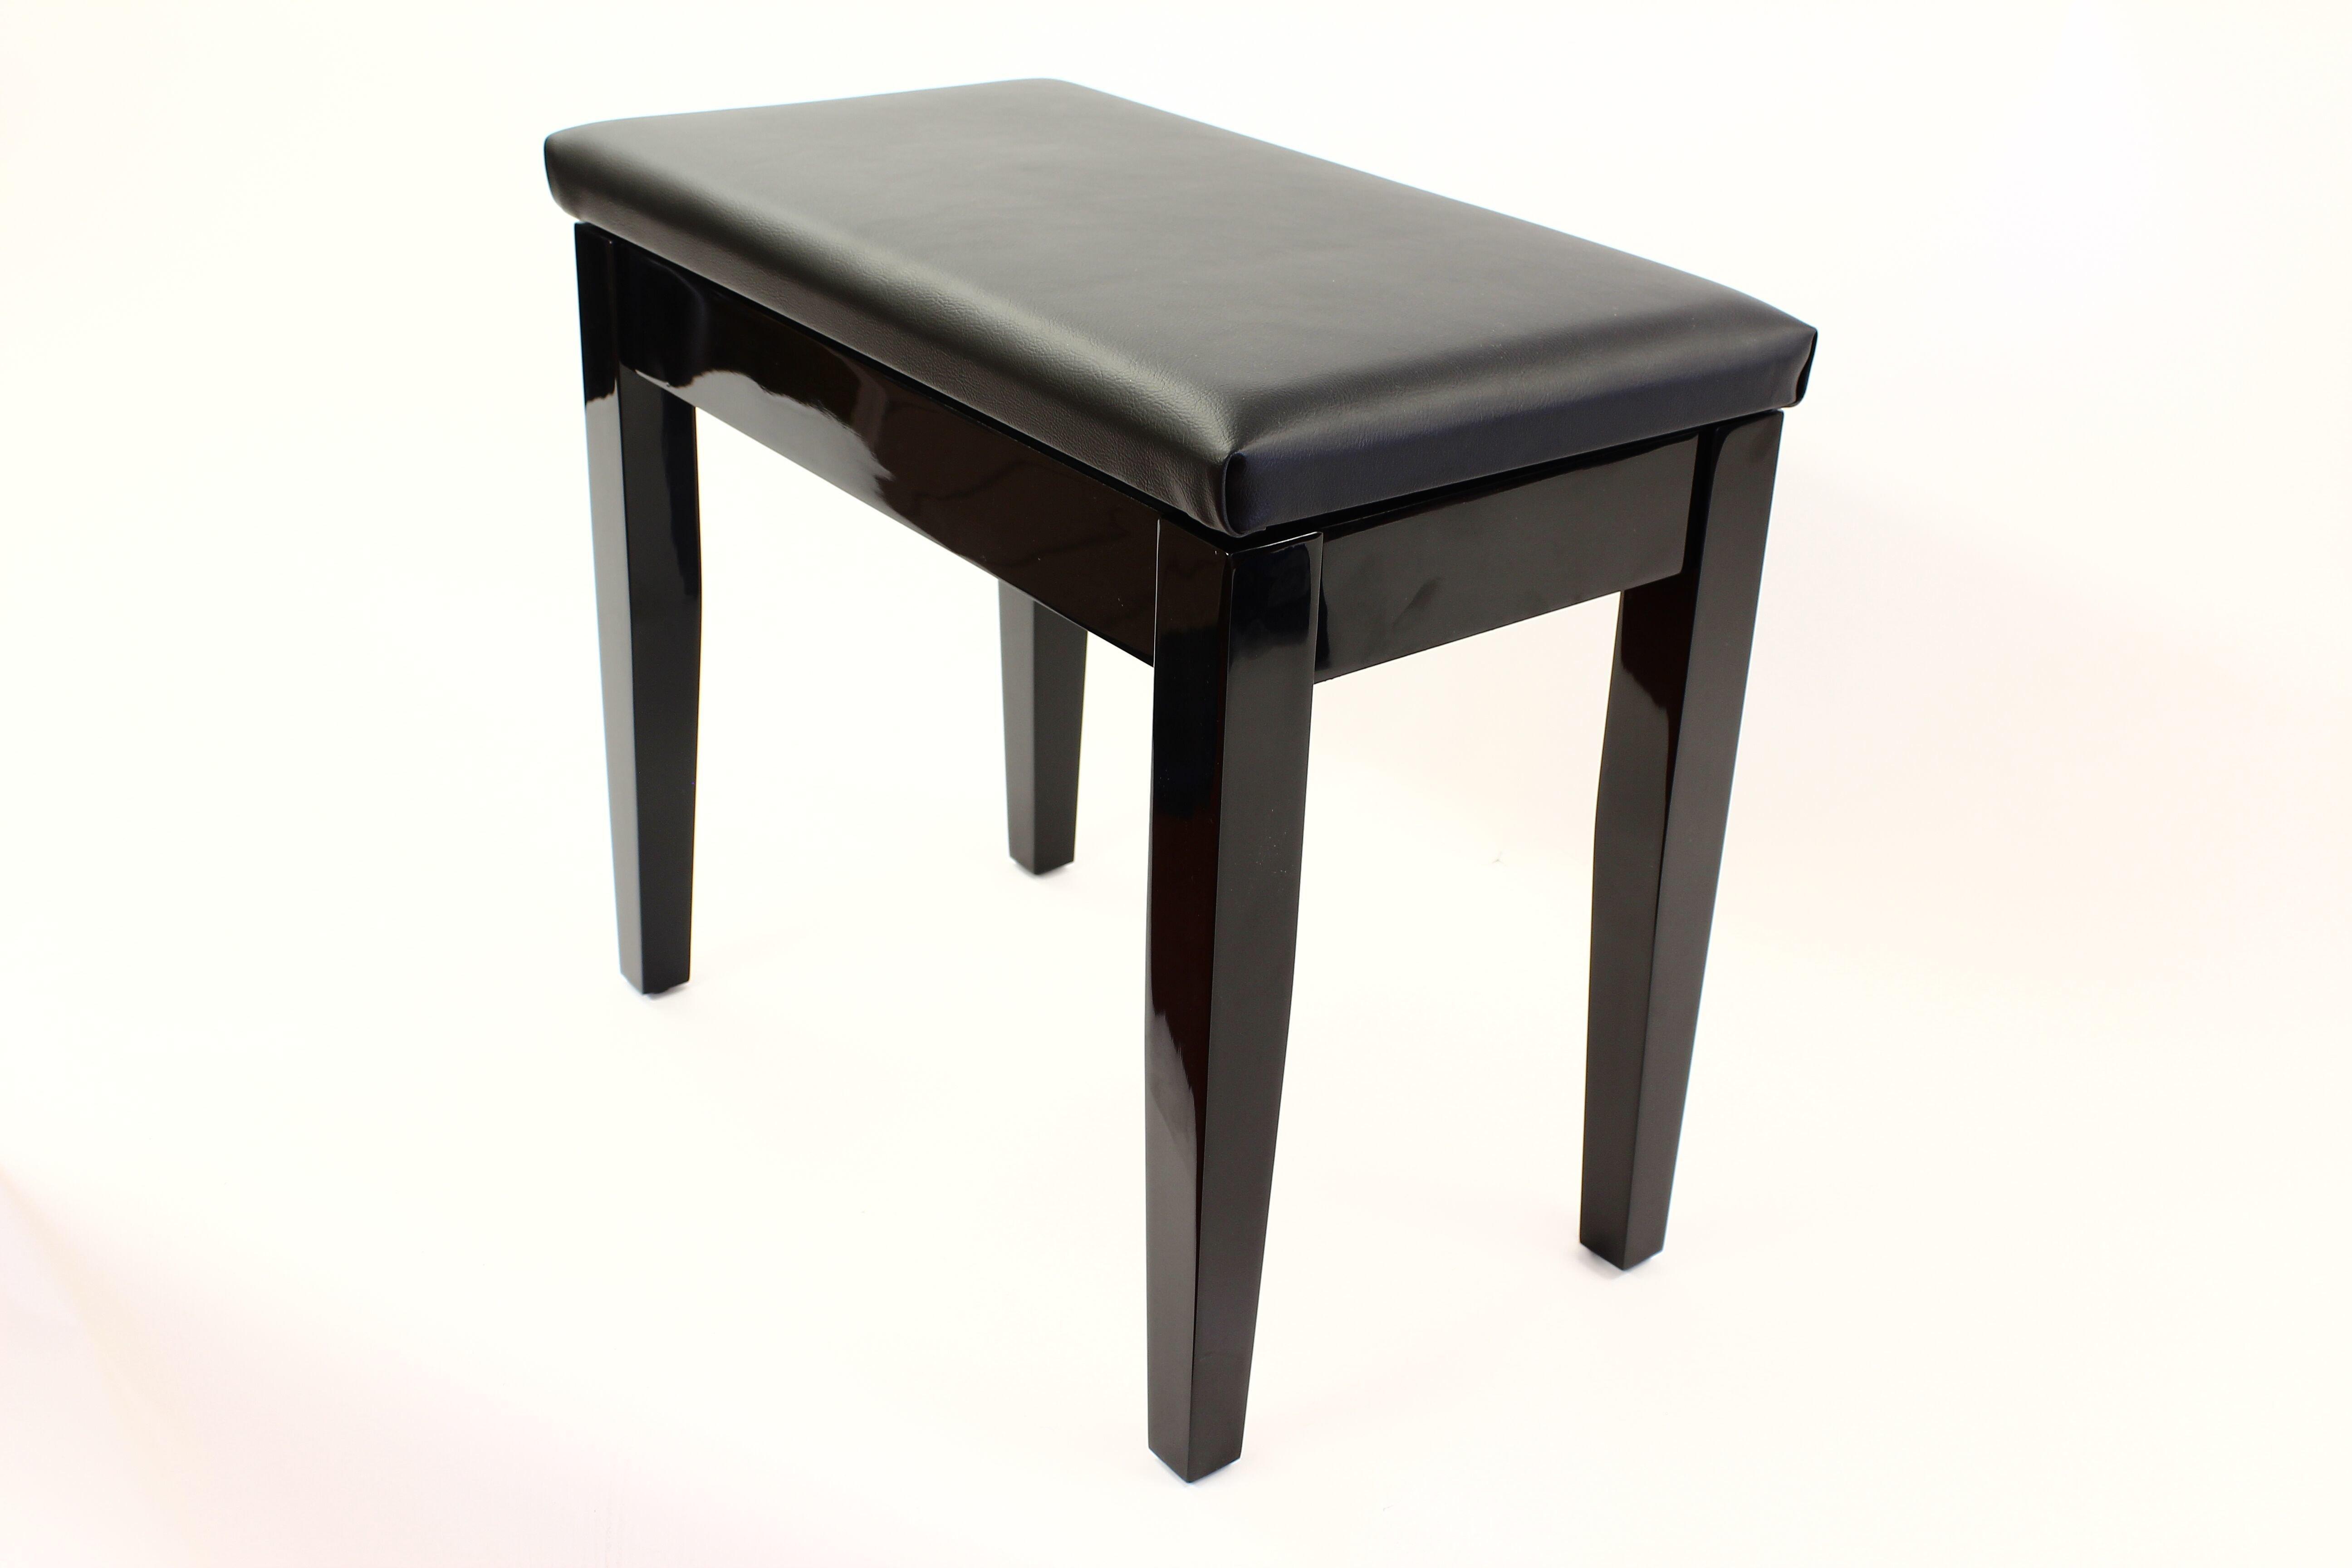 Coda Piano Stool Black with Storage